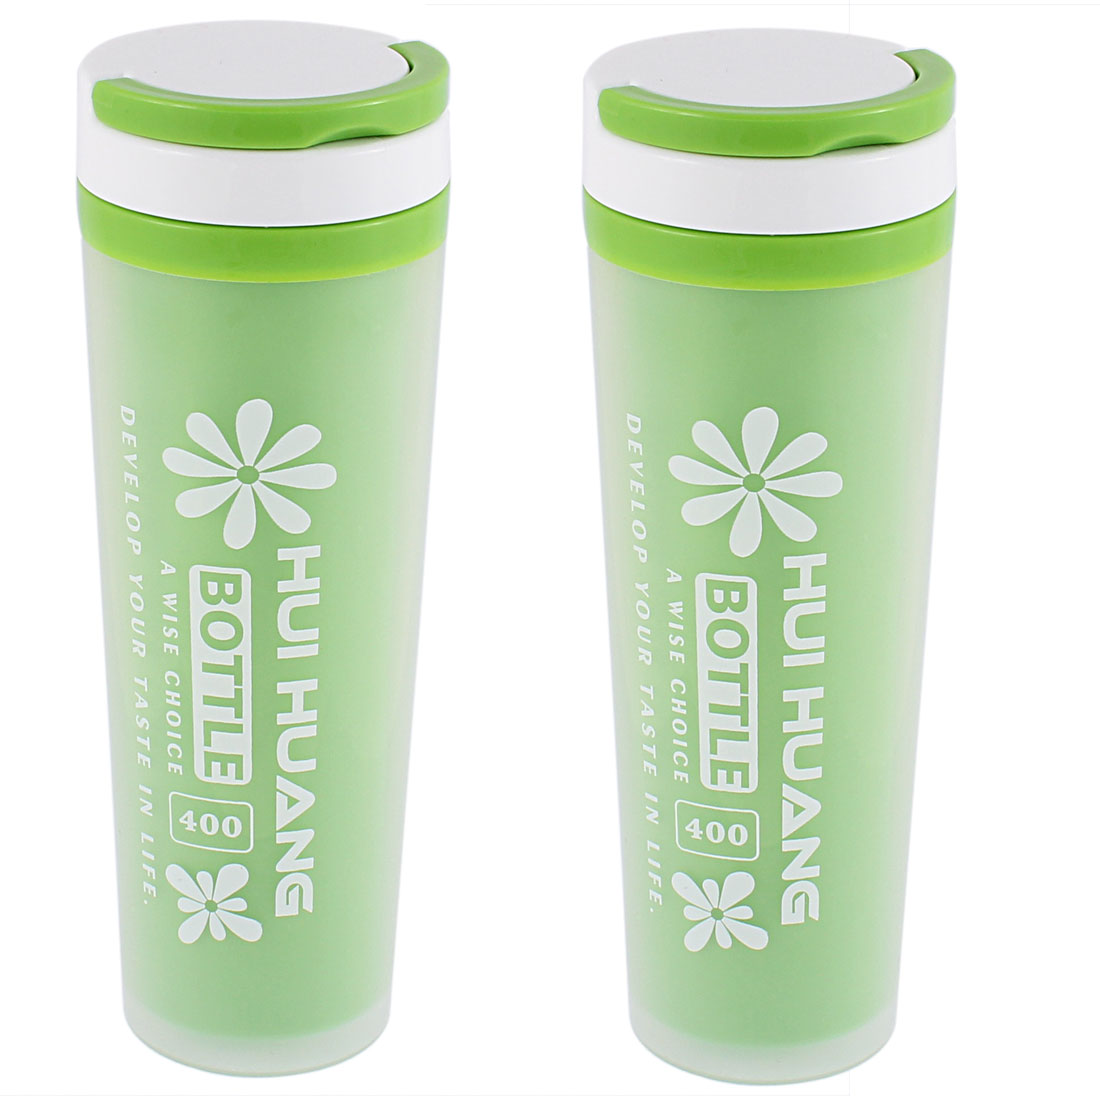 Water Tea Insulated Heat Retaining Bottle Cup Mug Vacuum Flask 400ml Green 2pcs